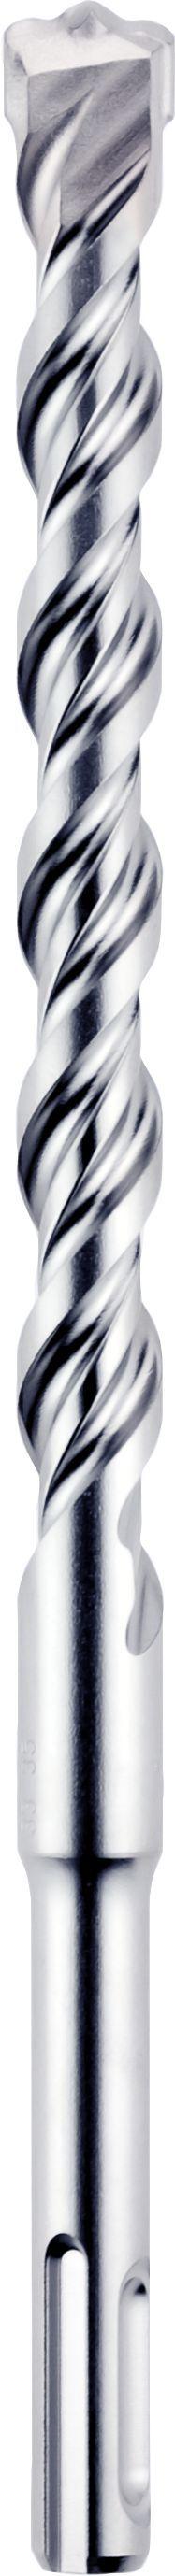 Slika BORER Rocket 3 SDS-plus 12x450 mm